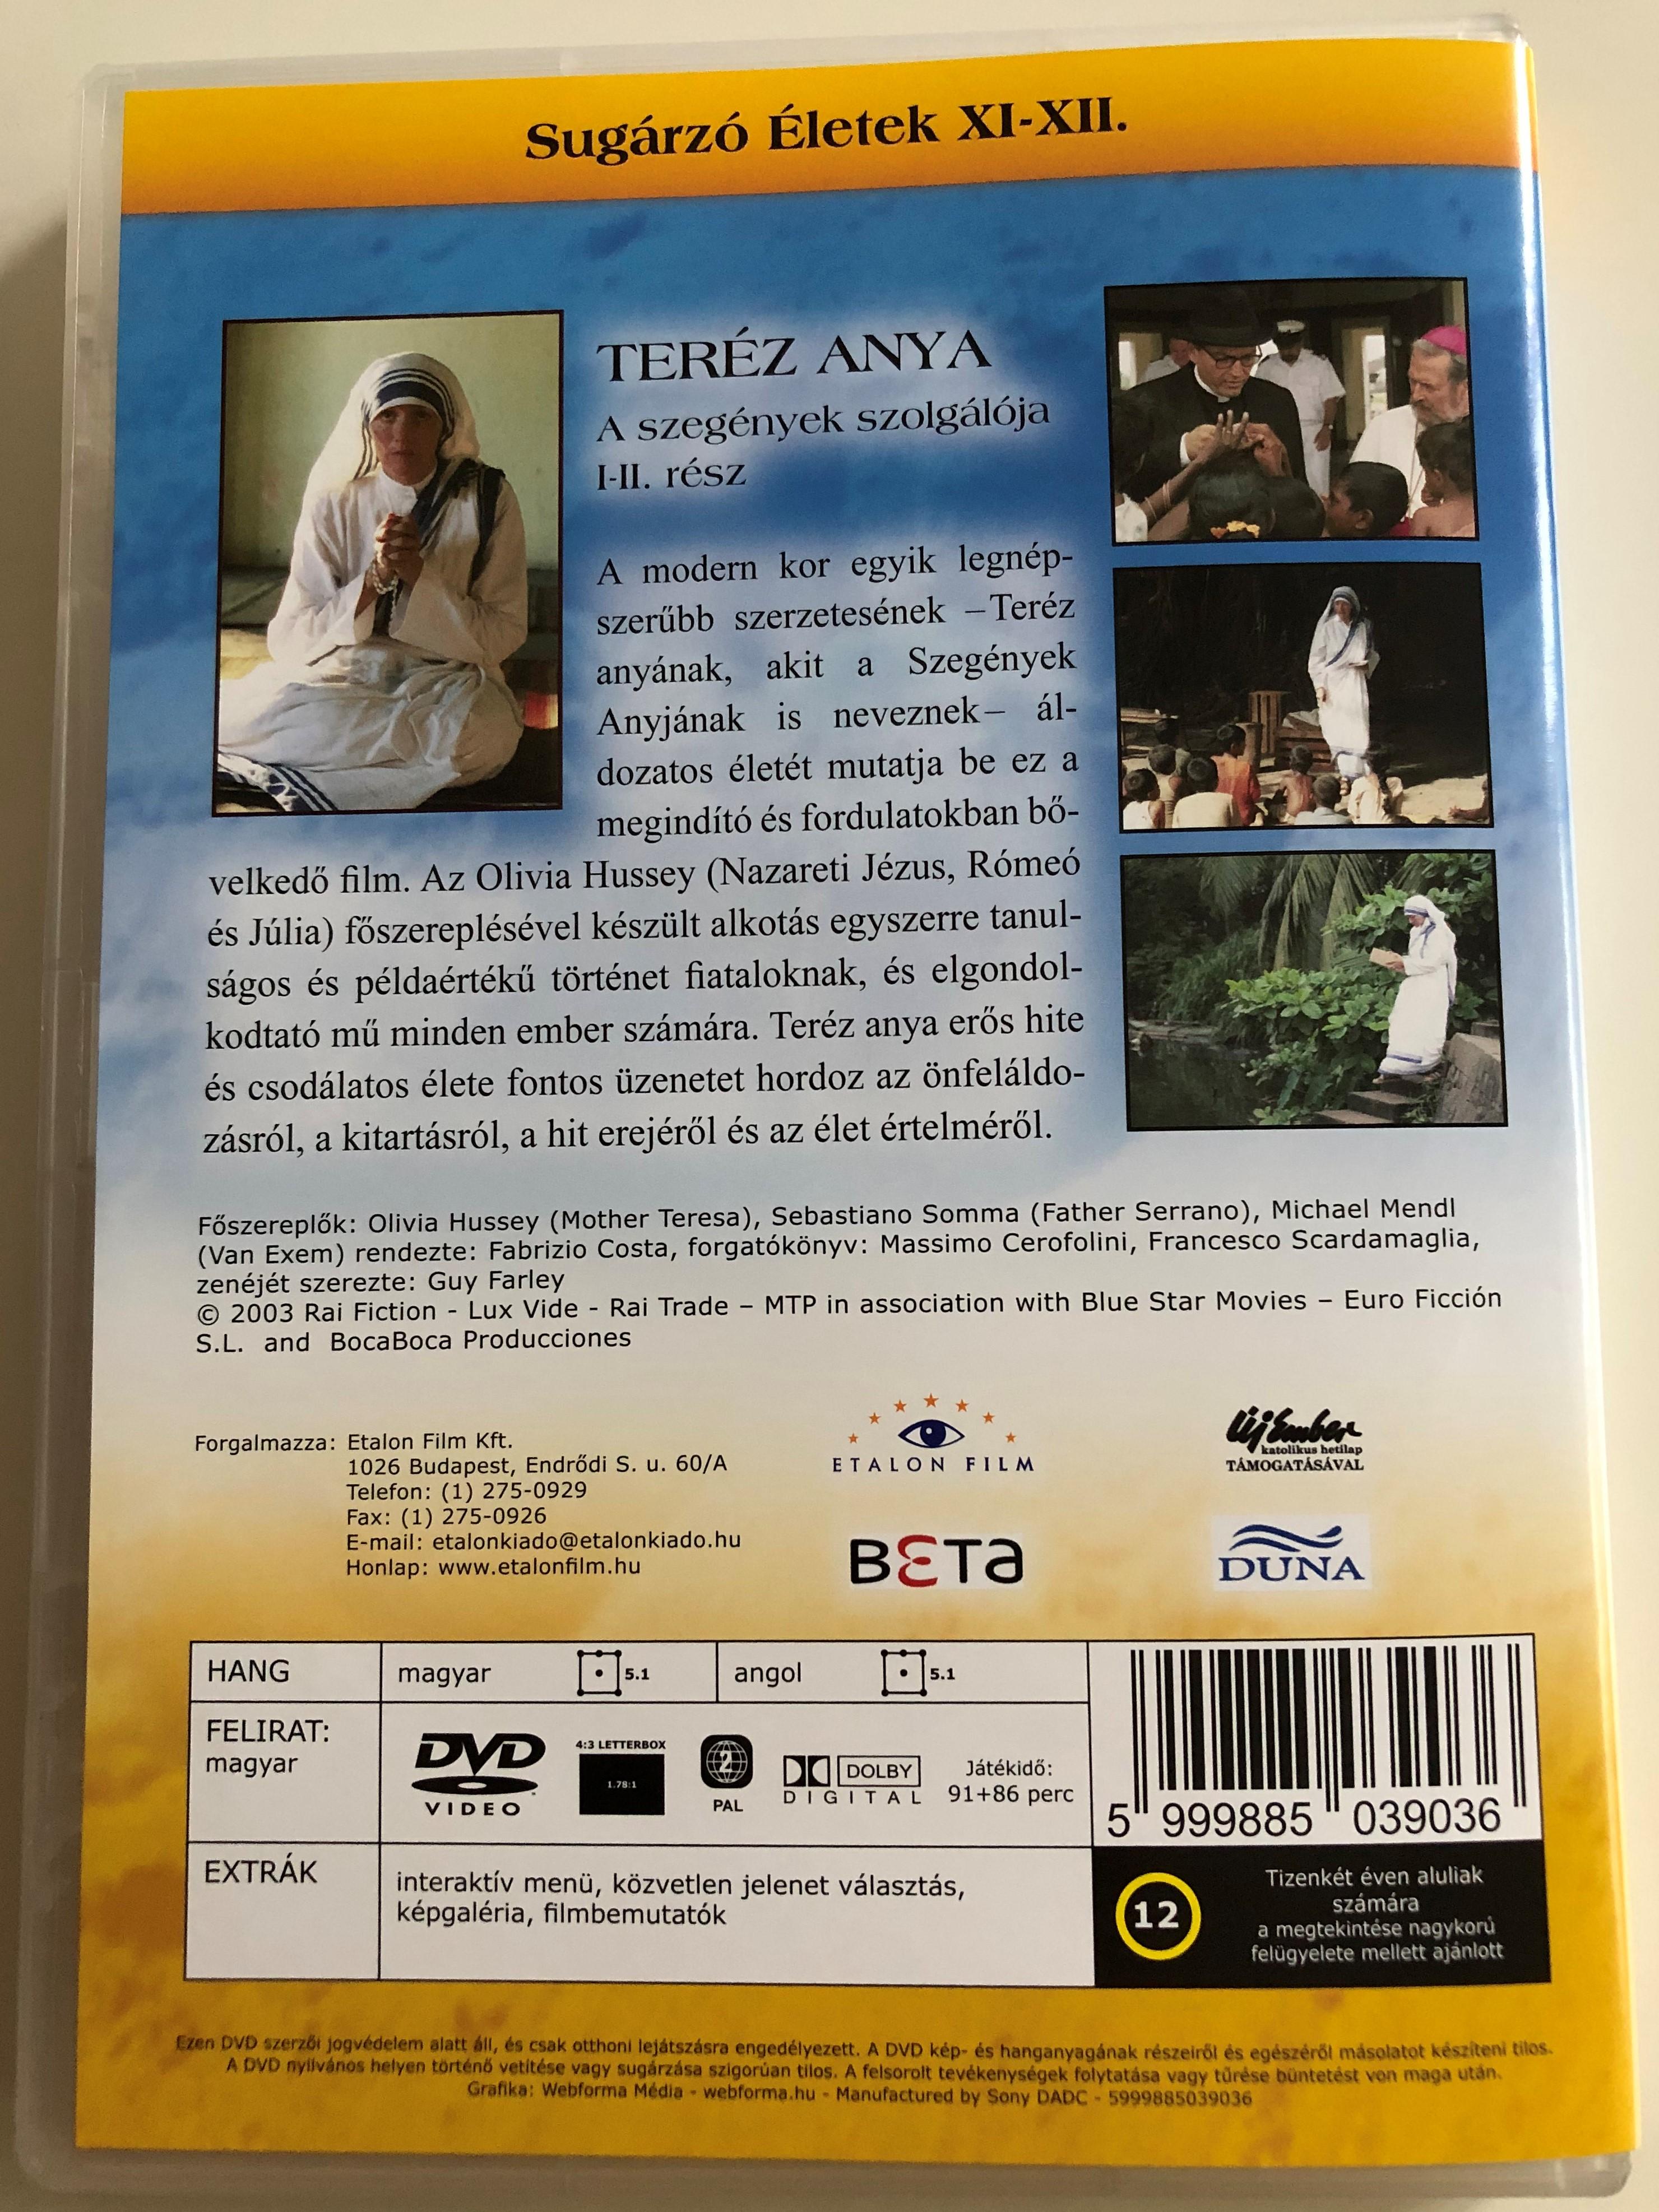 madre-teresa-part-i-ii-dvd-2003-ter-z-anya-a-szeg-nyek-szolg-l-ja-i-ii-directed-by-fabrizio-costa-starring-olivia-hussey-sebastiano-somma-michael-mendl-3-.jpg